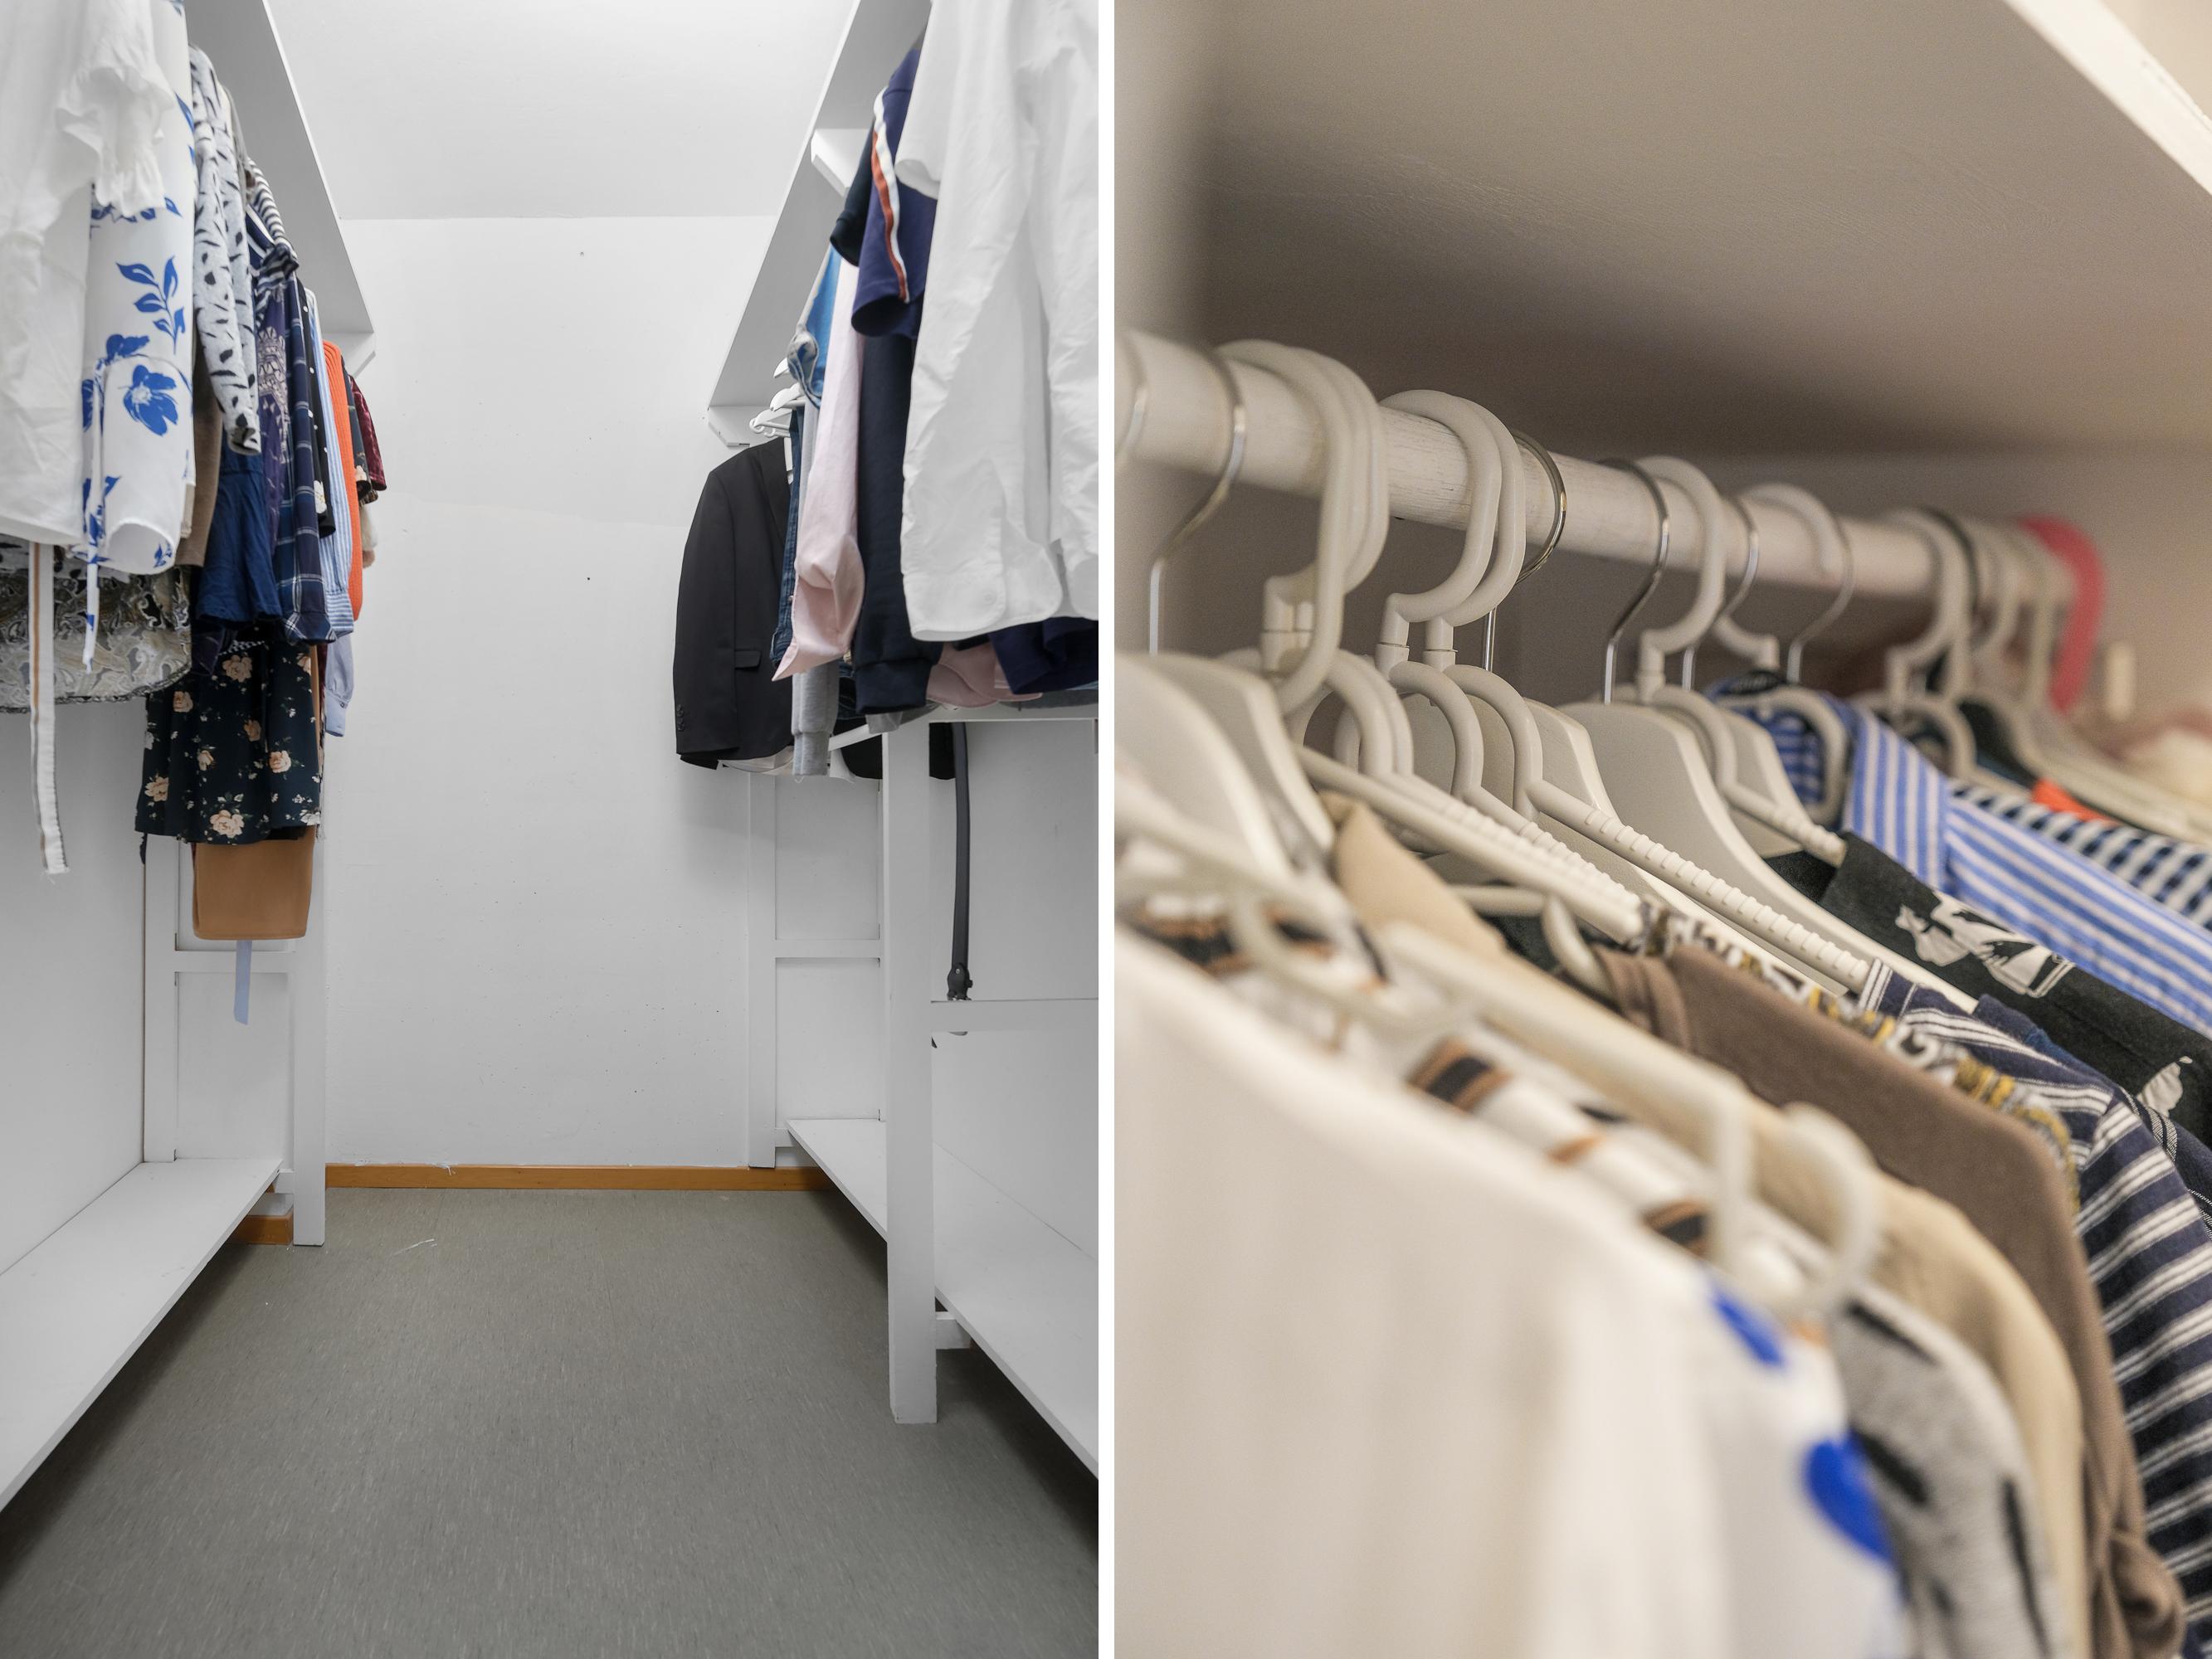 Generös klädkammare